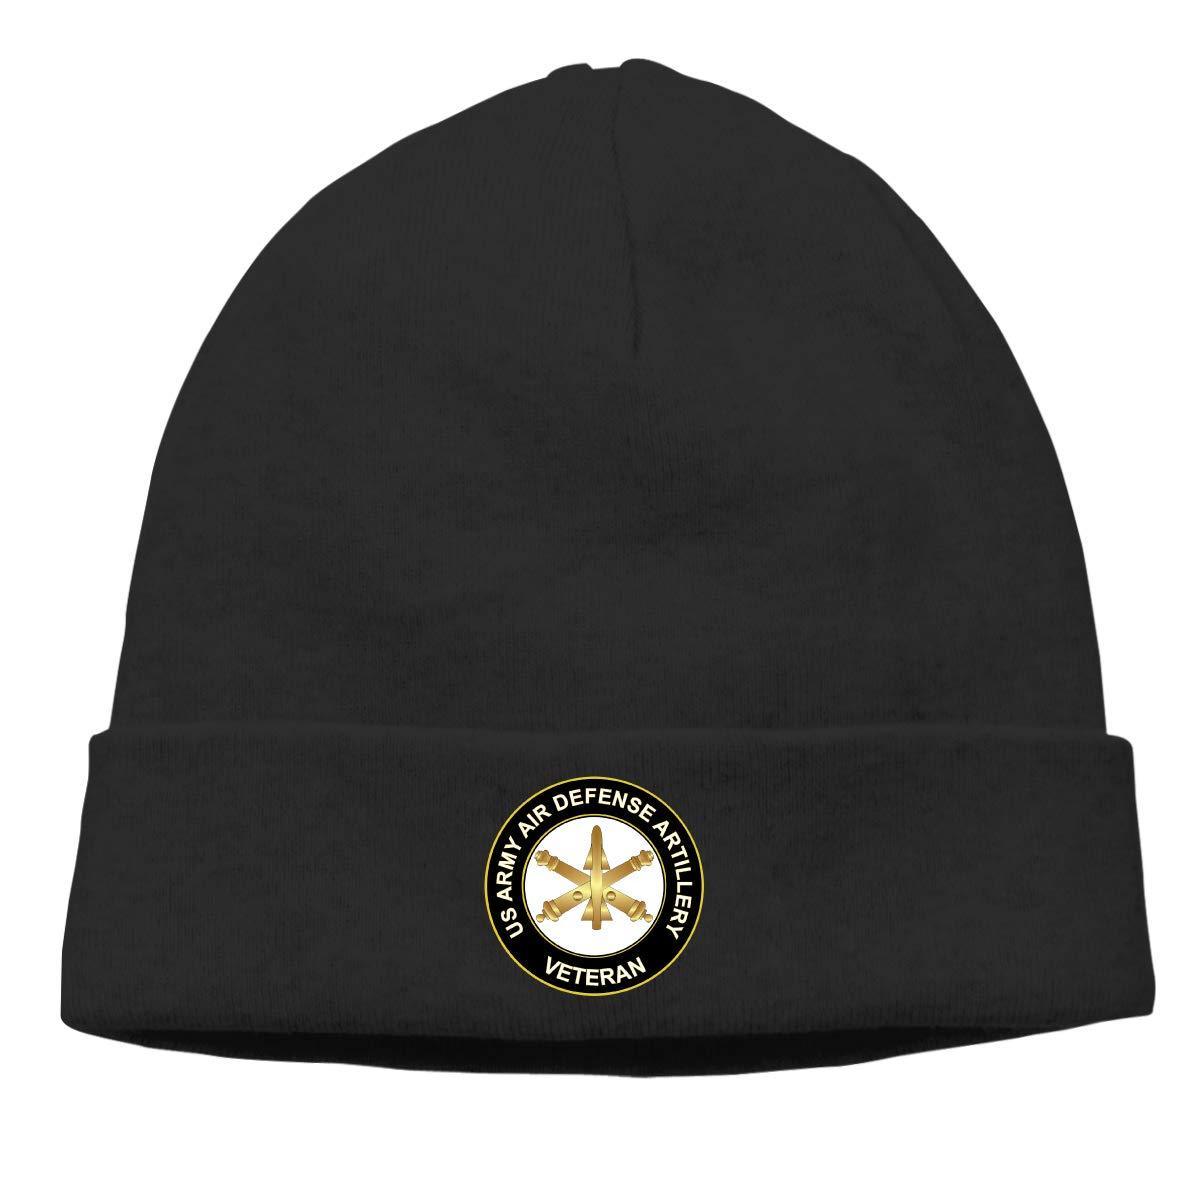 njsdi US Army Veteran Air Defense Logo Men Women Lightweight Casual Winter Beanie